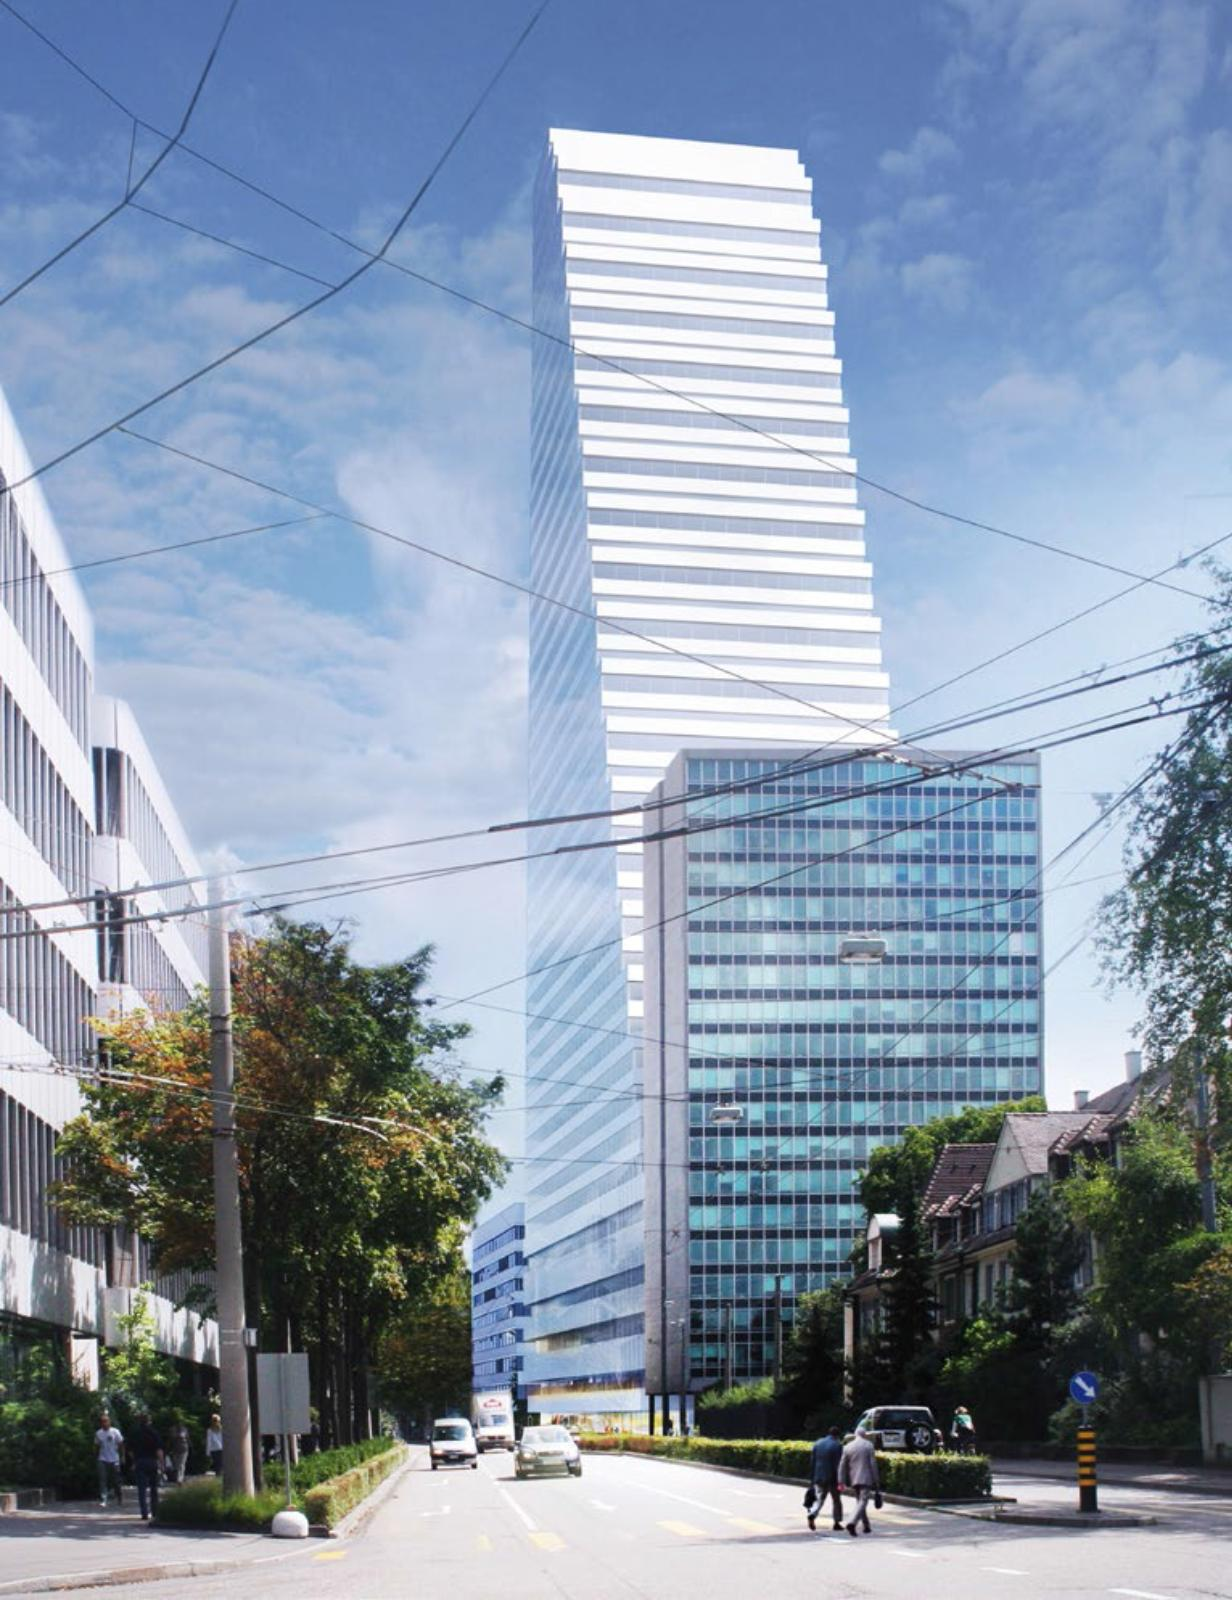 Roche opens Building 1